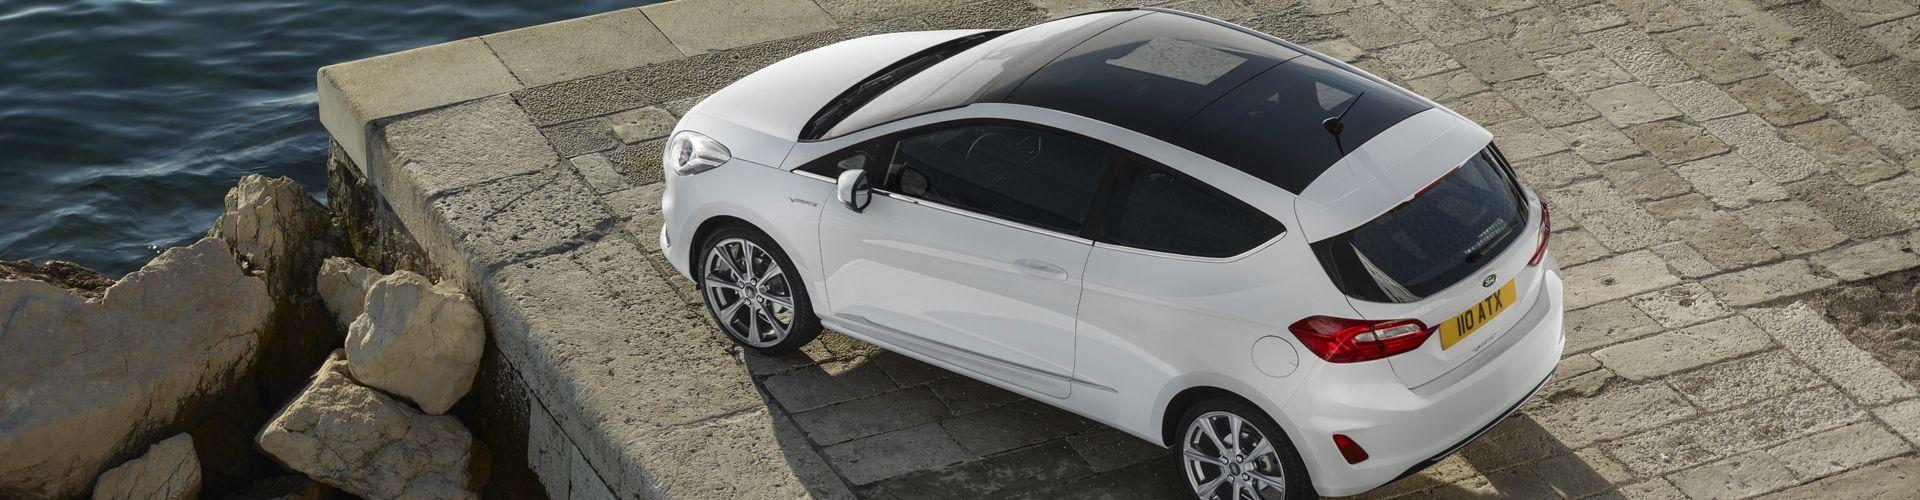 Ford Fiesta Vignale - Liapis Bros